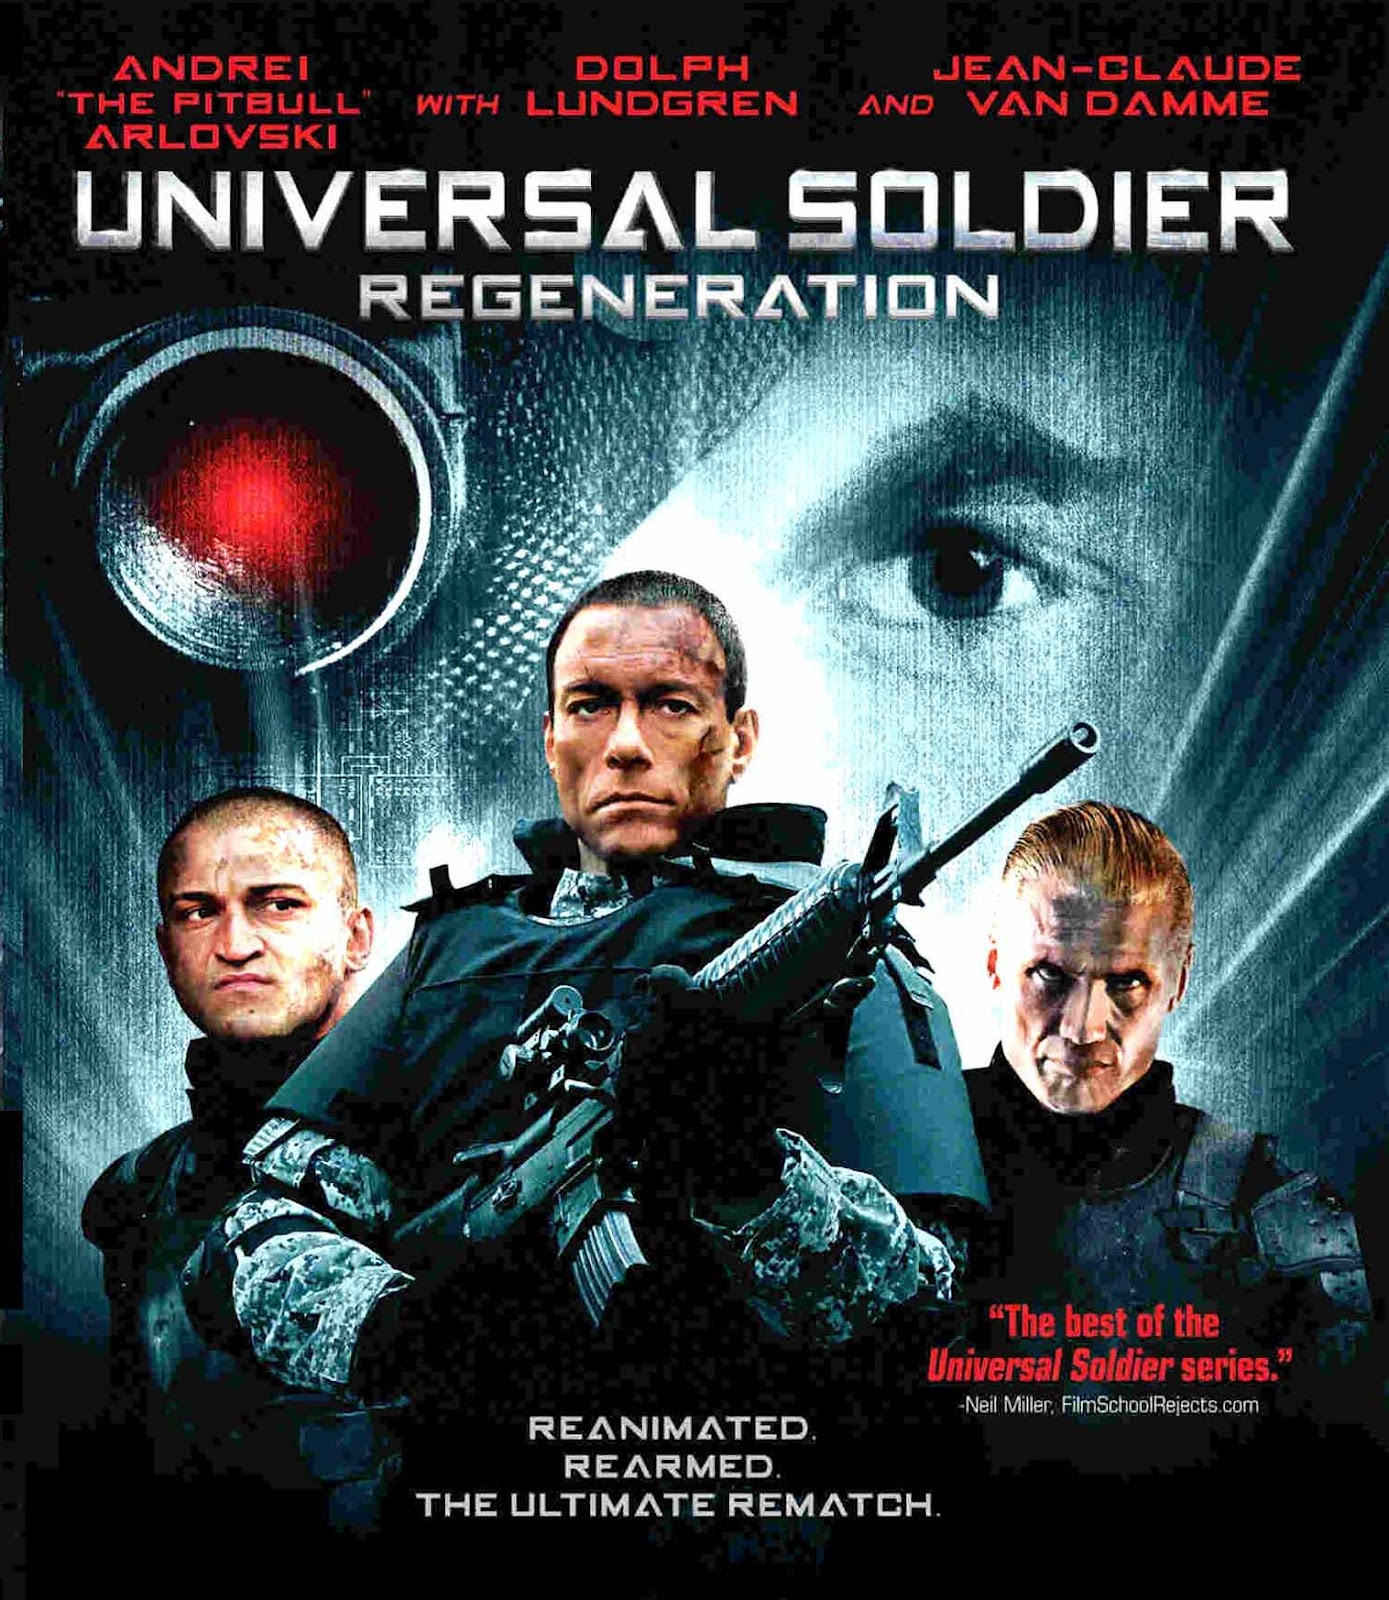 Universal-Soldier-Regeneration-Poster.jpg